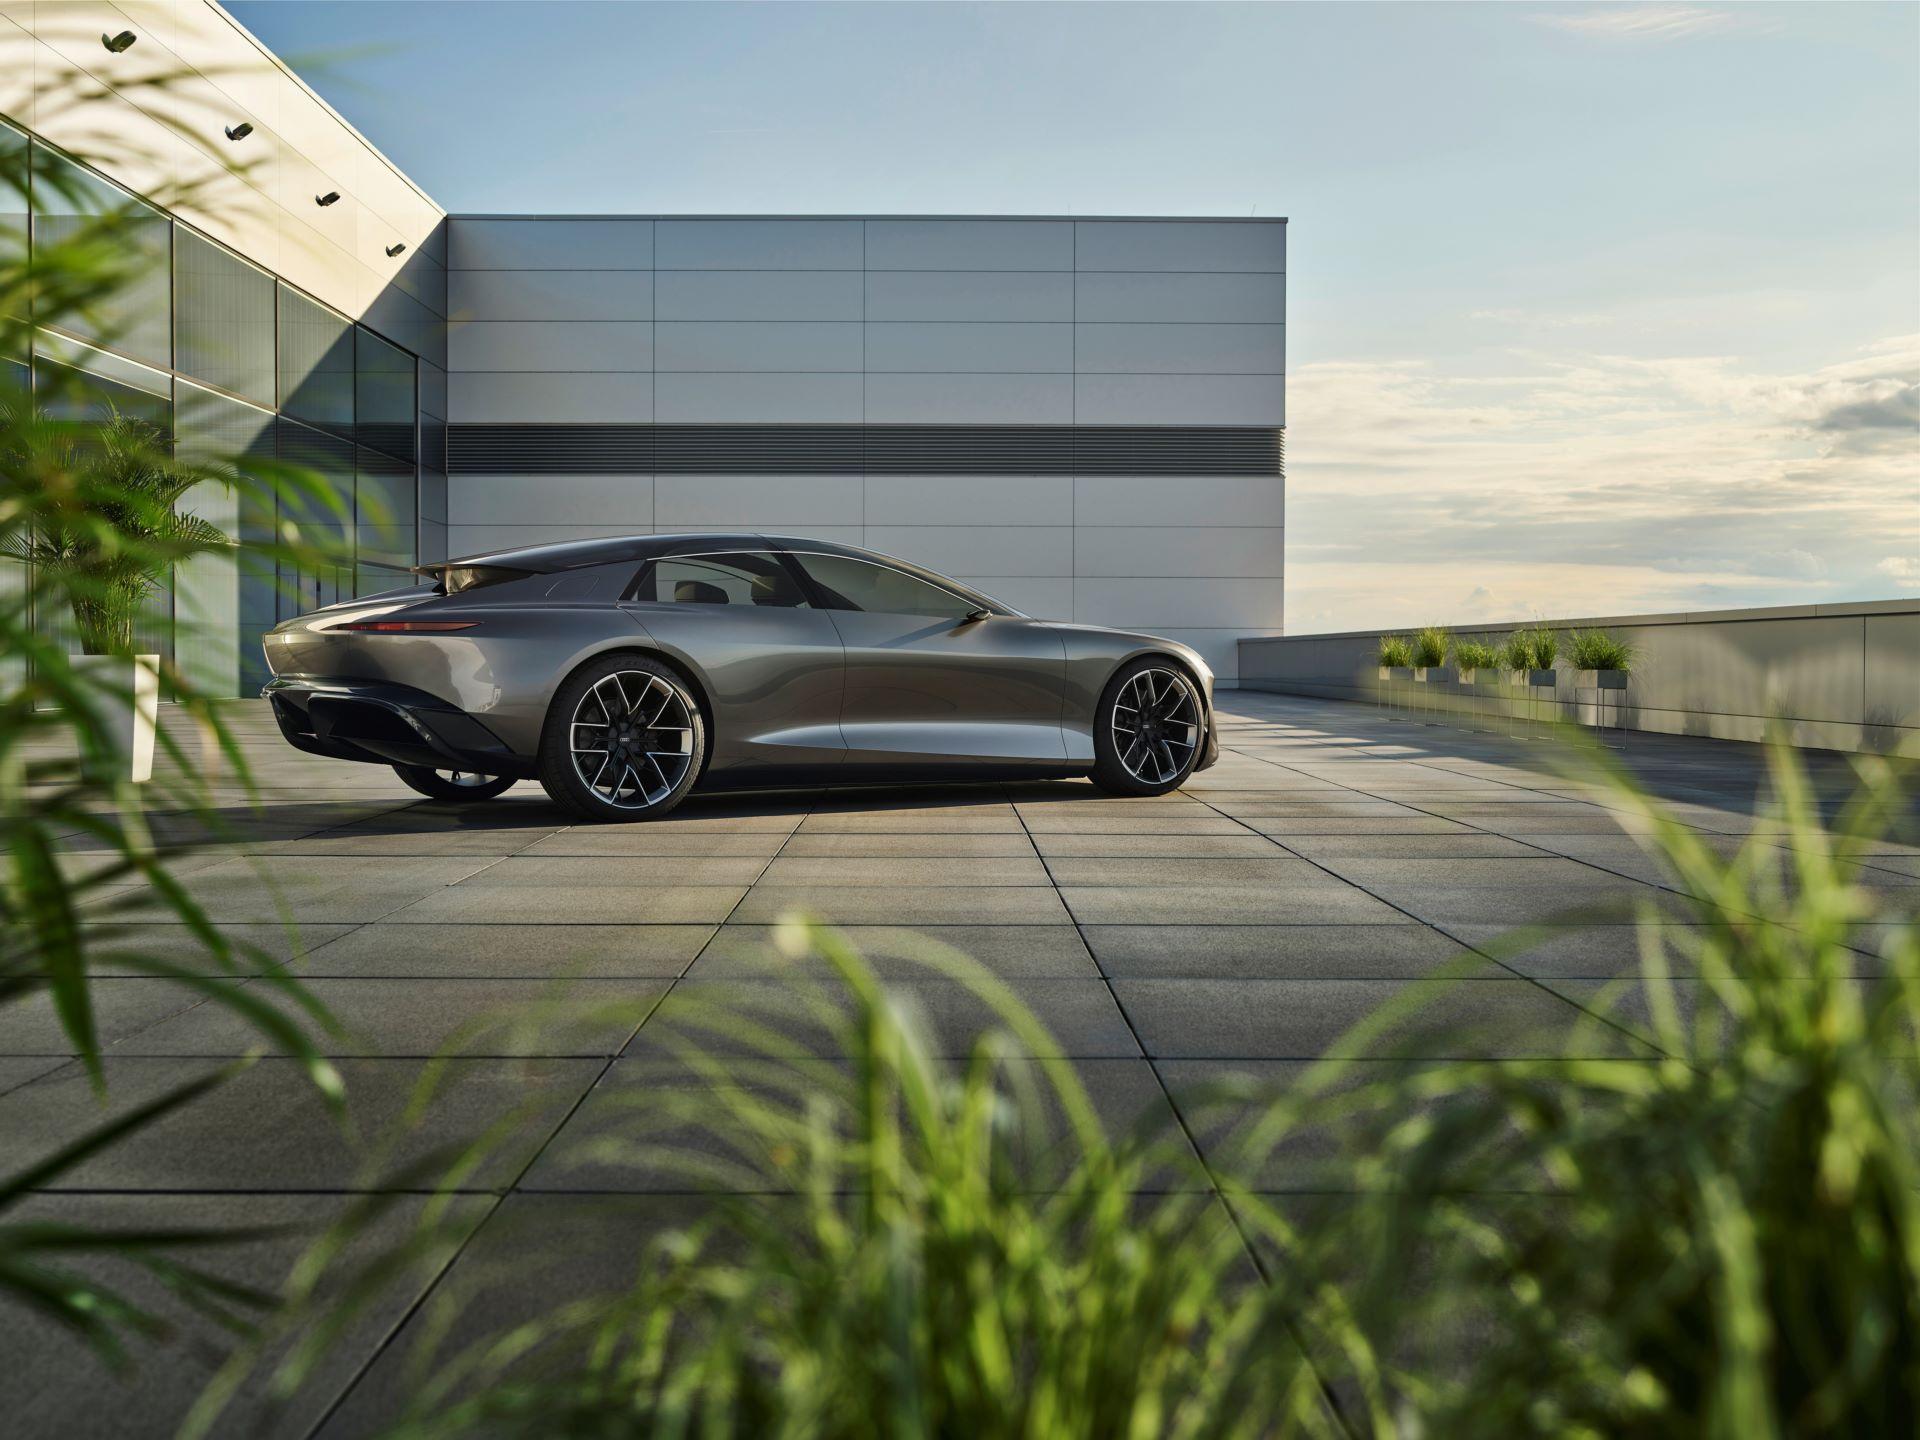 Audi-GrandSphere-concept-3